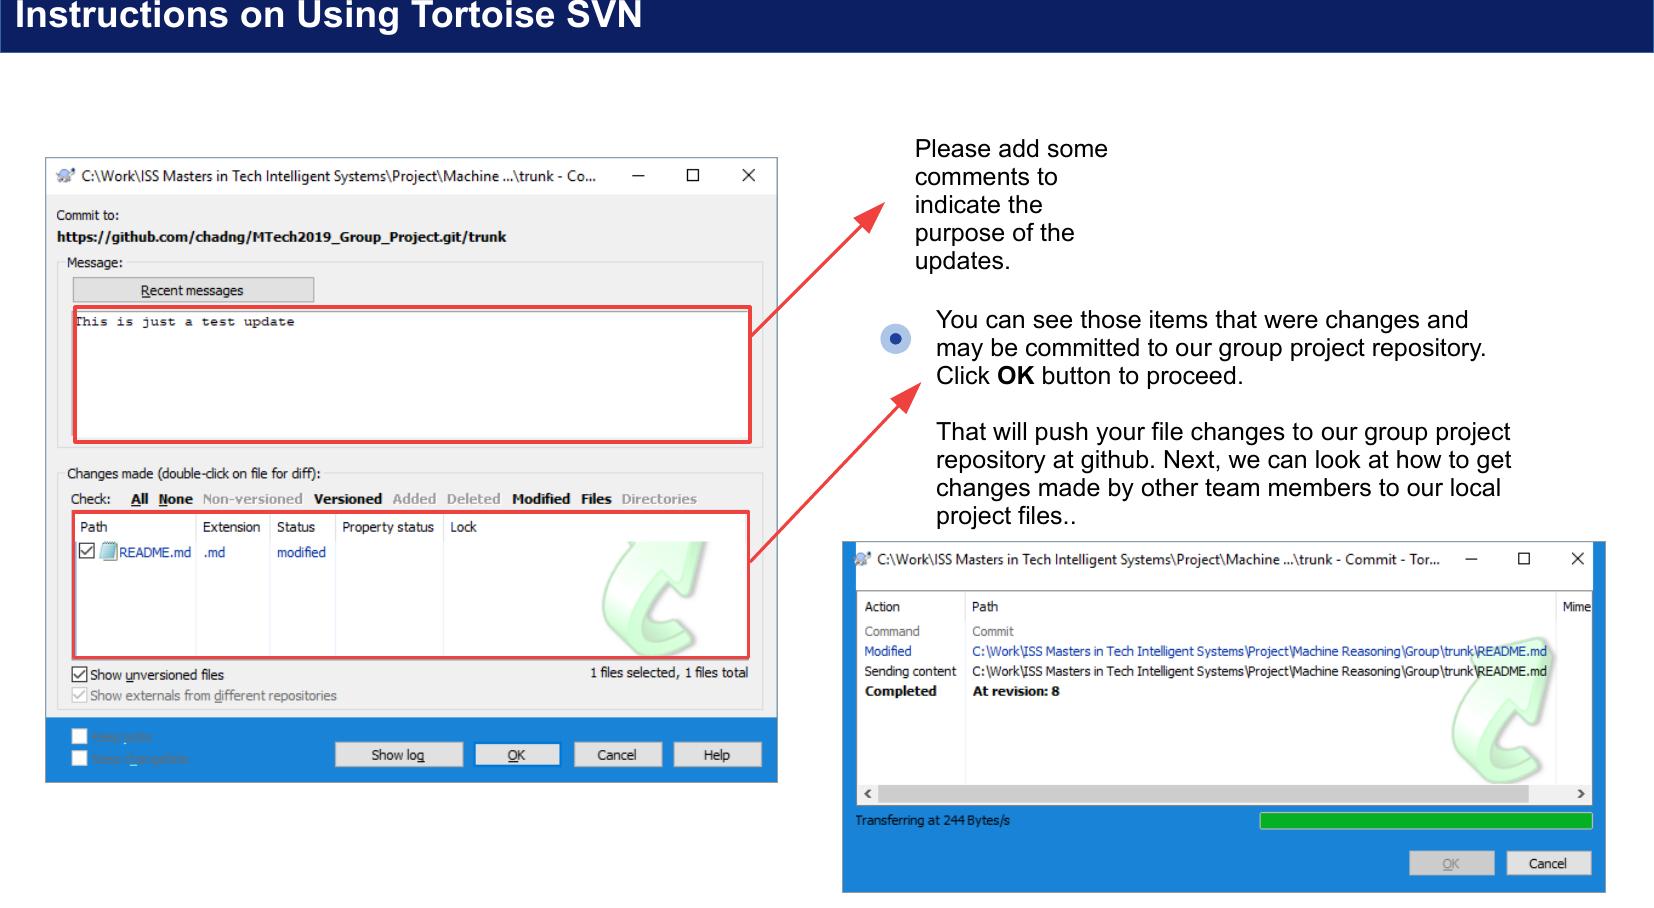 Tortoise SVN Guide